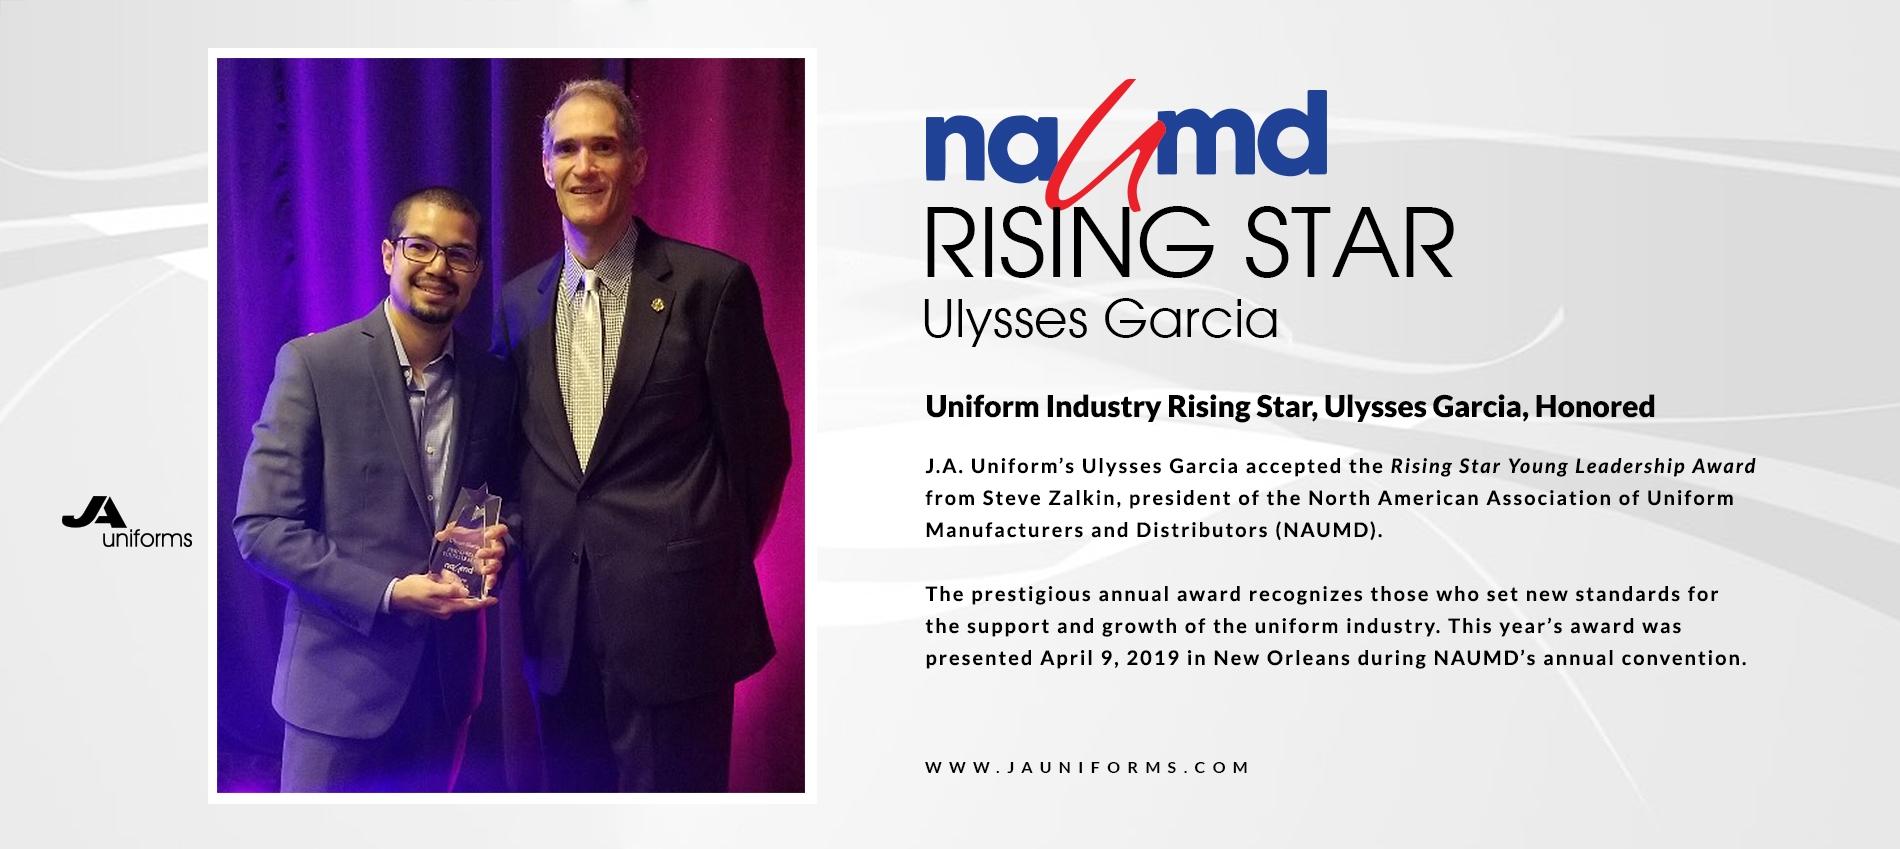 NAUMD Rising Star Ulysses Garcia